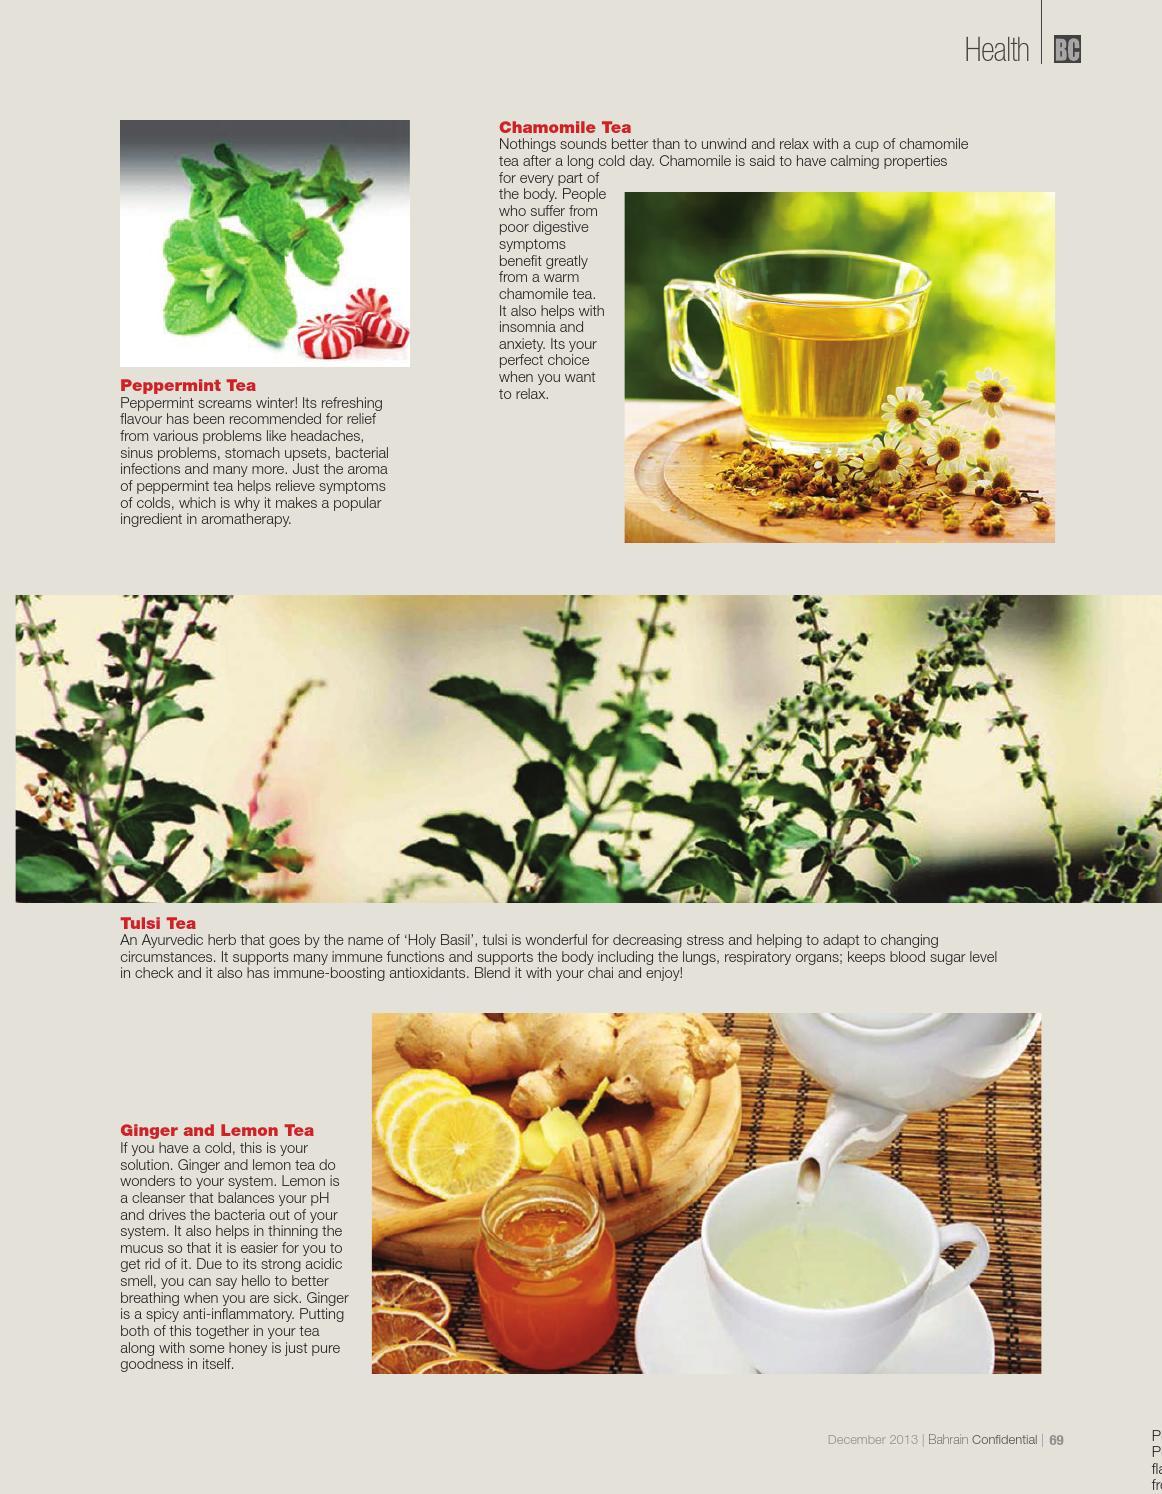 Chinese herbal insomnia tea - Chinese Herbal Insomnia Tea 74